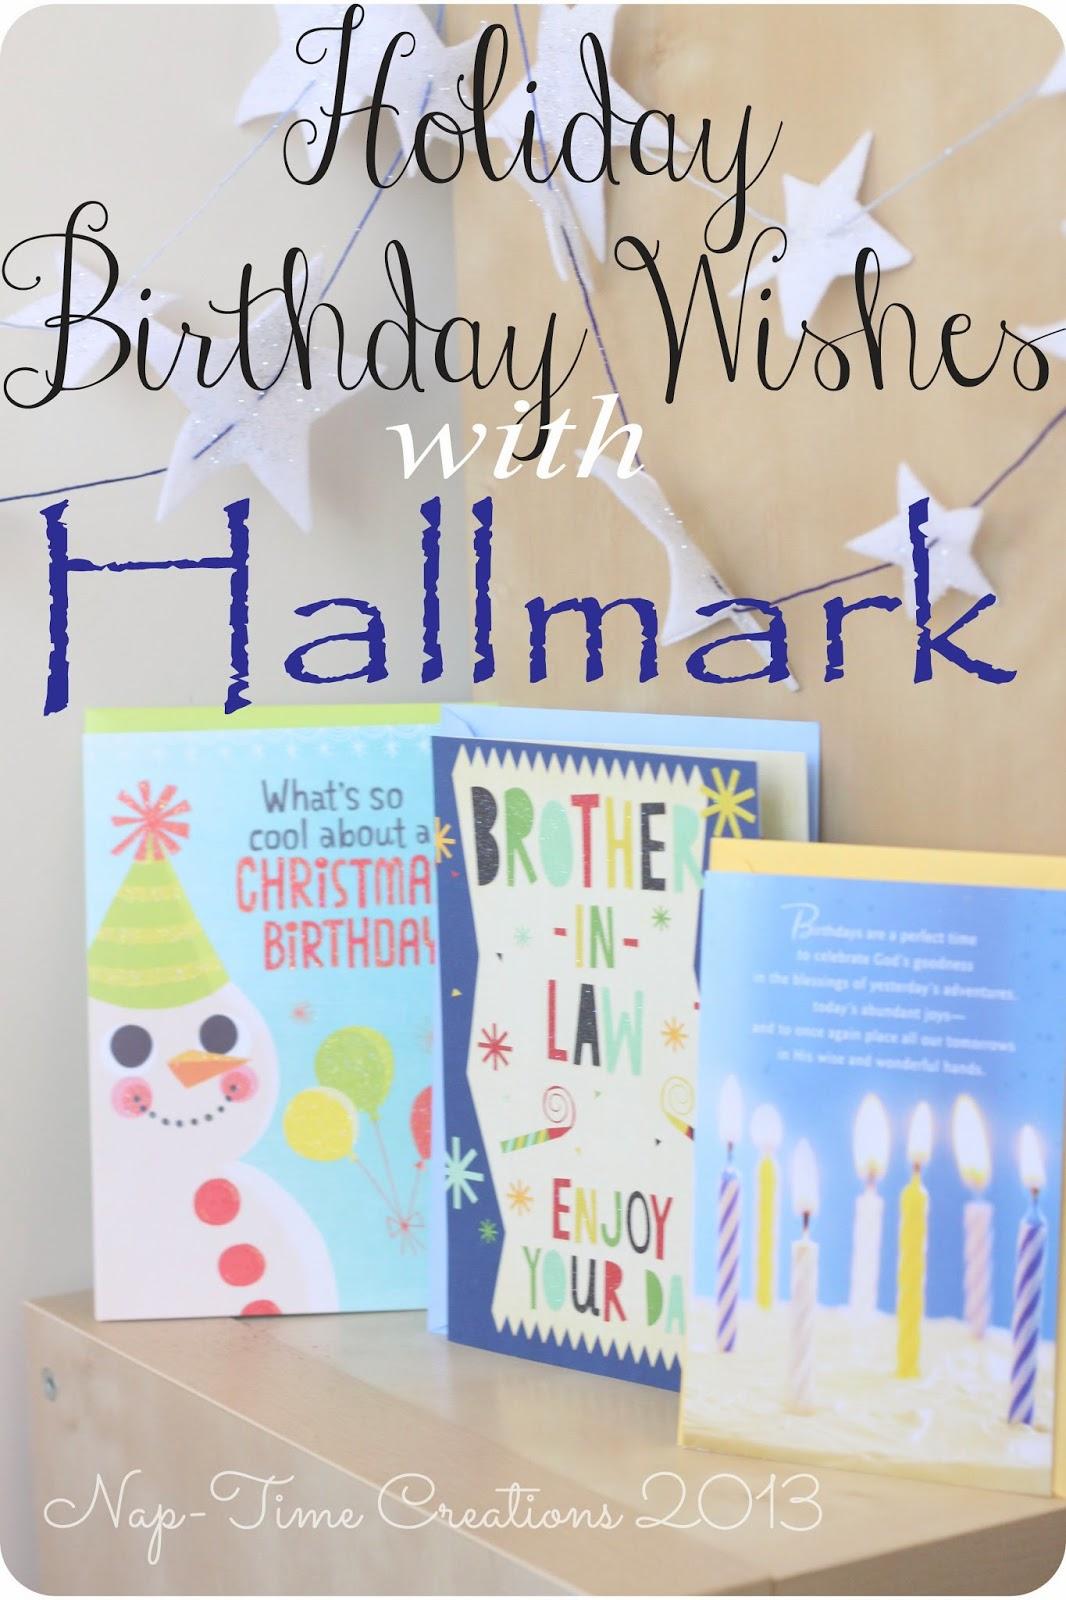 Holiday birthday wishes from hallmark life sew savory holiday birthday wishes from hallmark m4hsunfo